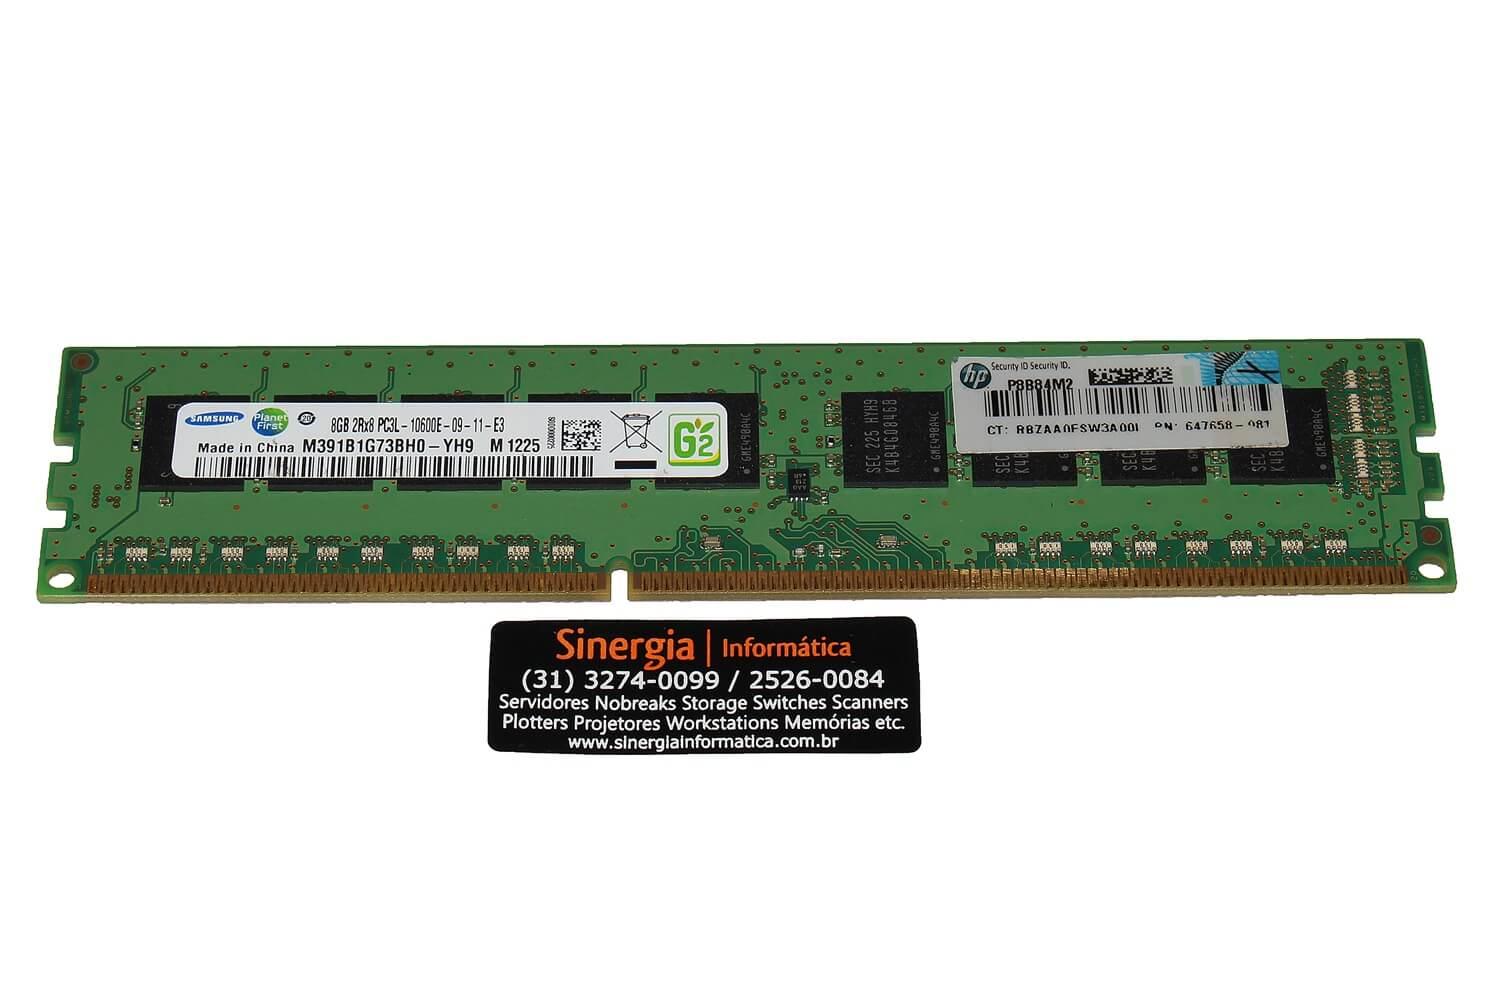 647658-081 Memória RAM HP 8GB DDR3 2Rx8 PC3L-10600E-09-11-E3 1333MHz ECC UDIMM para Servidor ML310e DL320e DL160 DL360e DL360p DL380e DL380p  ML350e ML350p Gen8 pronta entrega